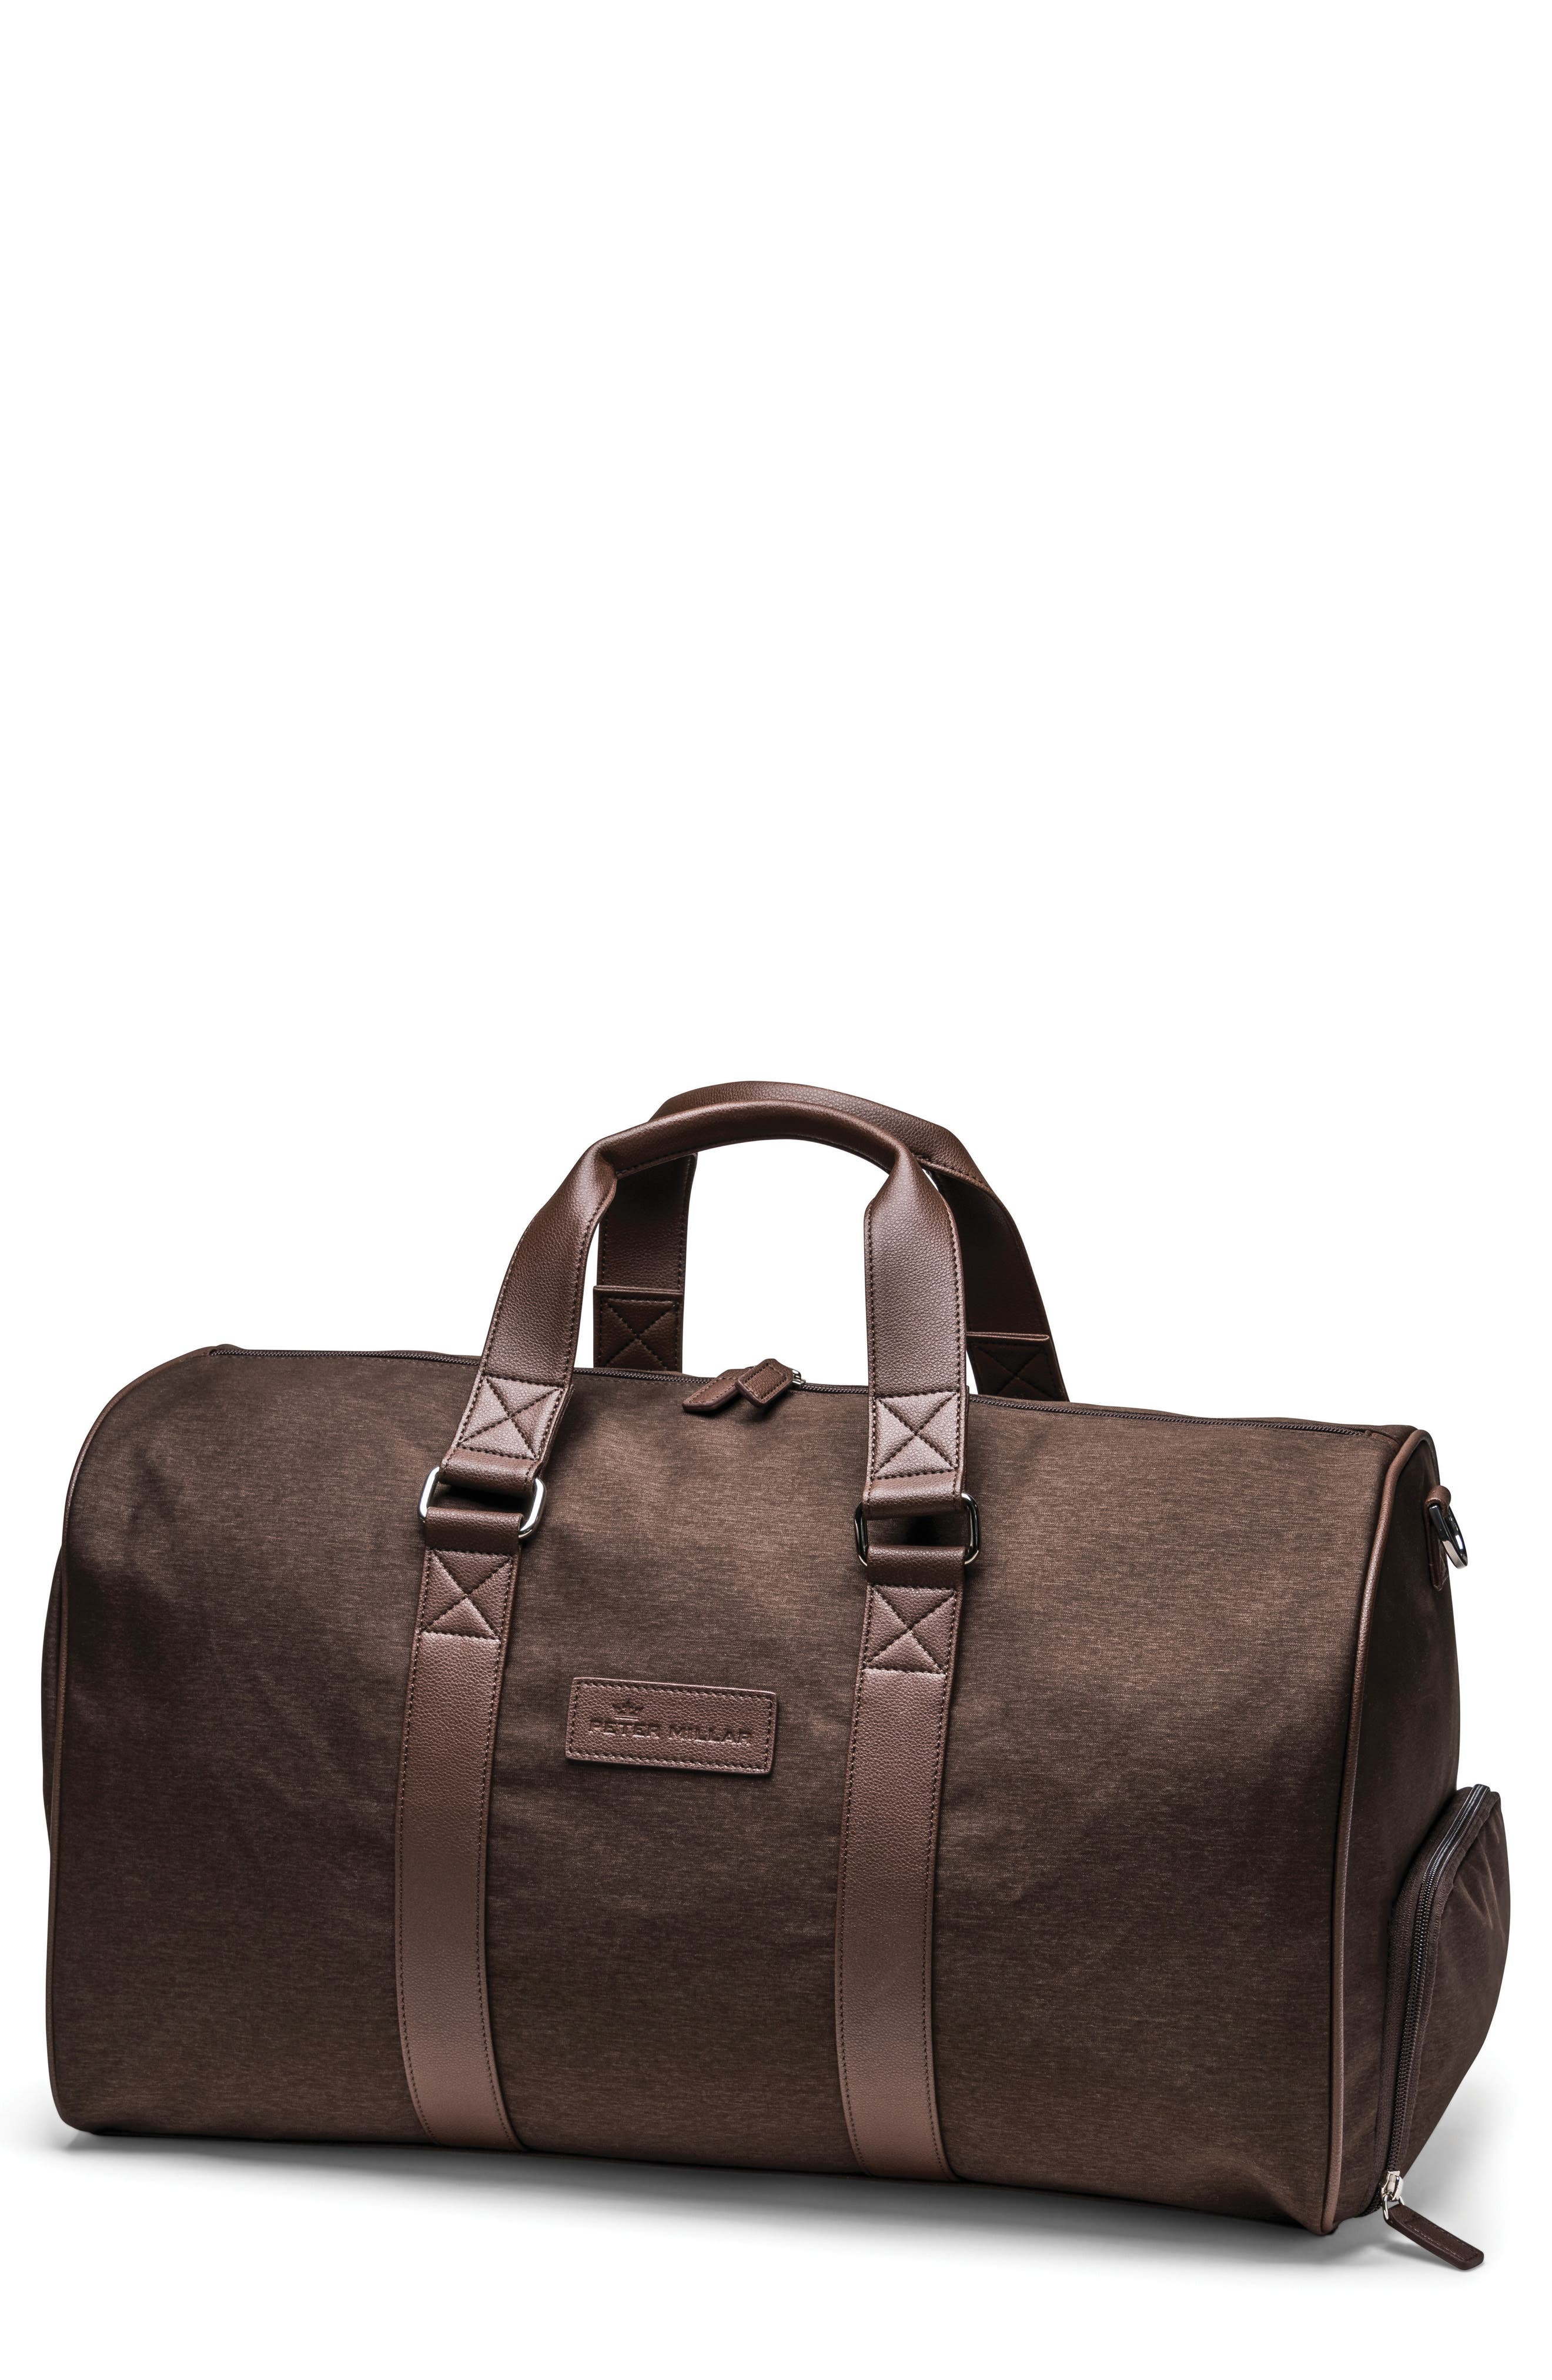 Twill Duffel Bag,                         Main,                         color, Chocolate